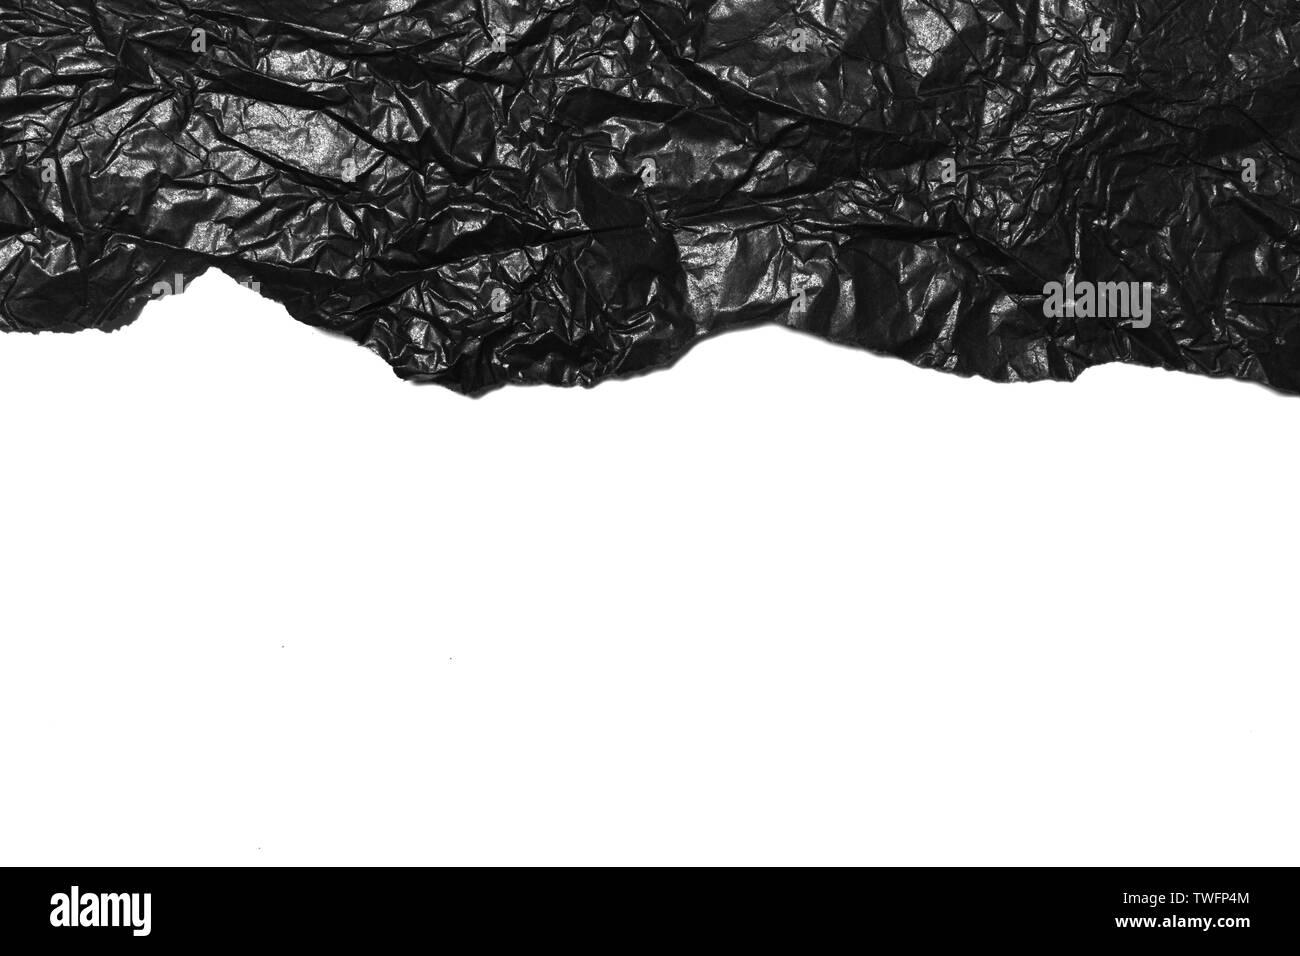 Black Paper Texture, Crumpled Paper Texture - Stock Image